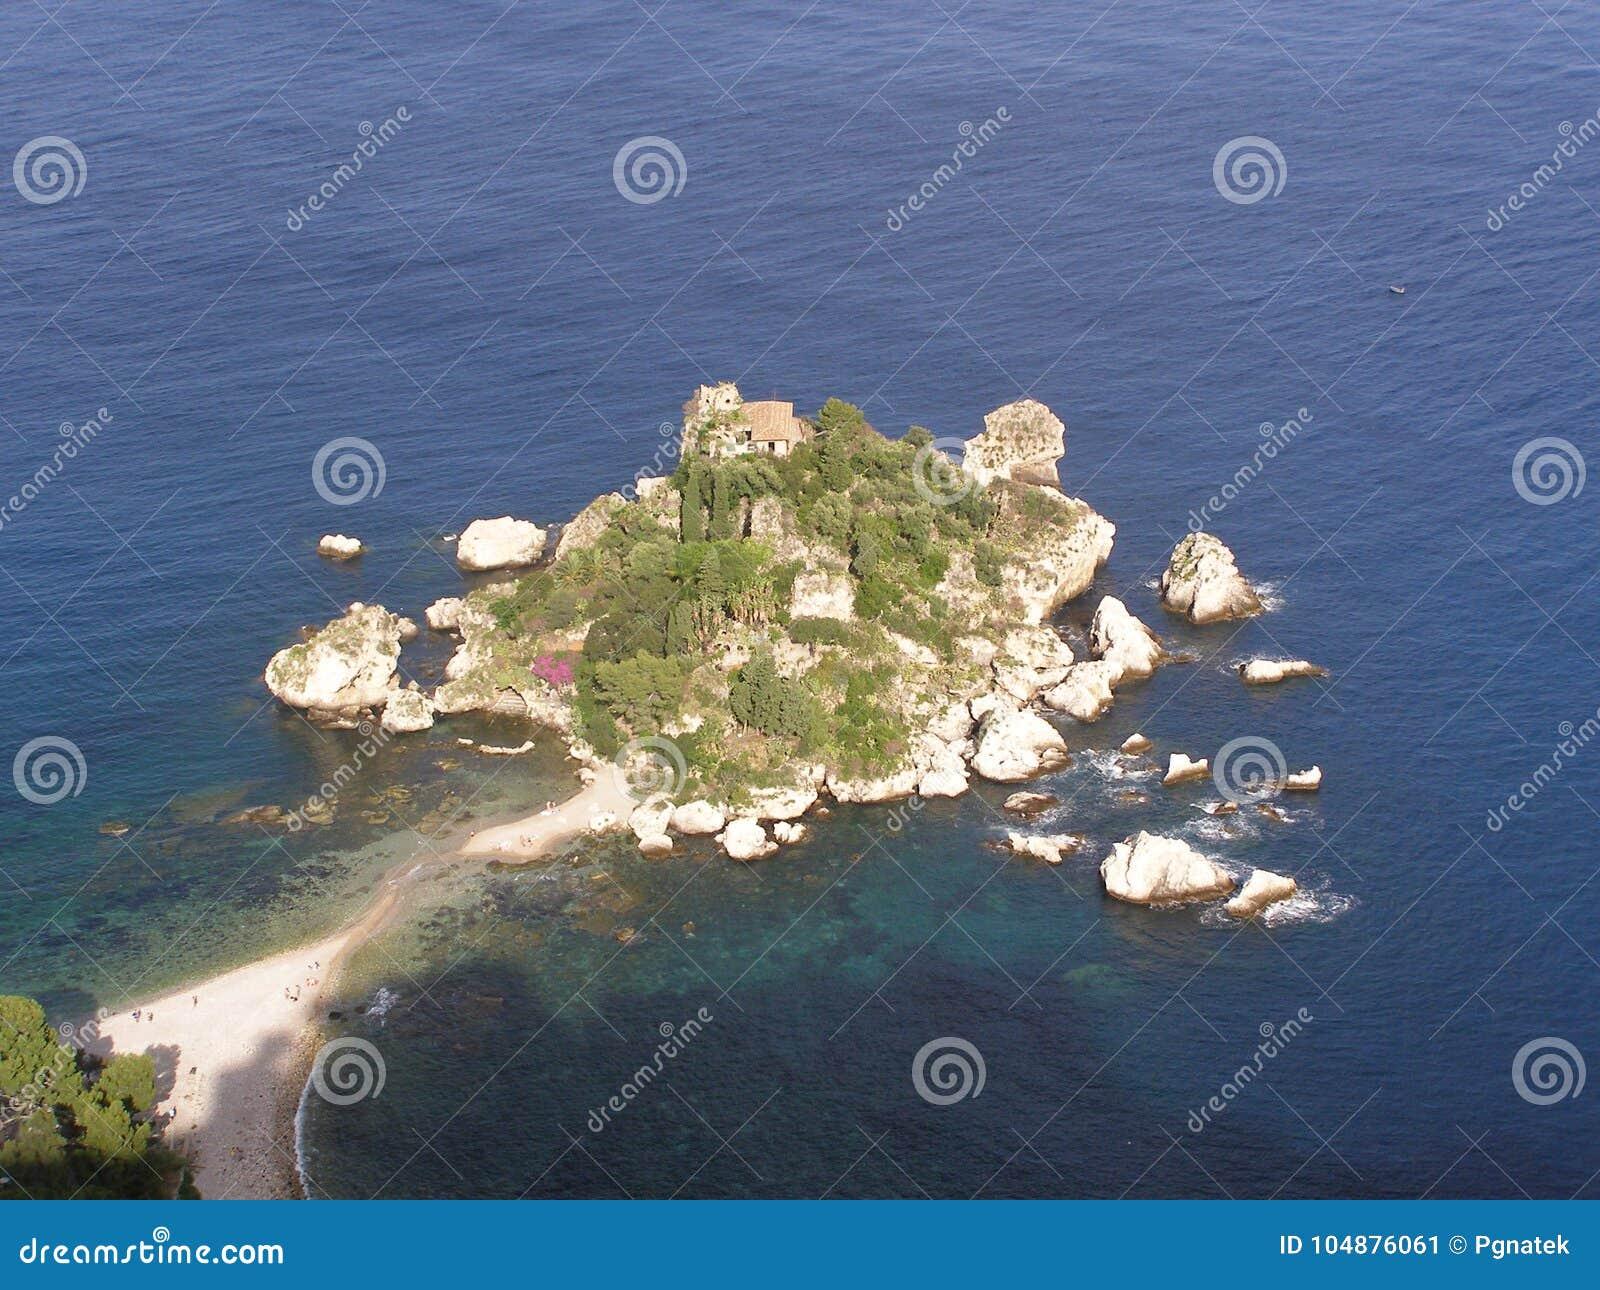 Isola Bella Taormina Sicily Italy la mer Méditerranée